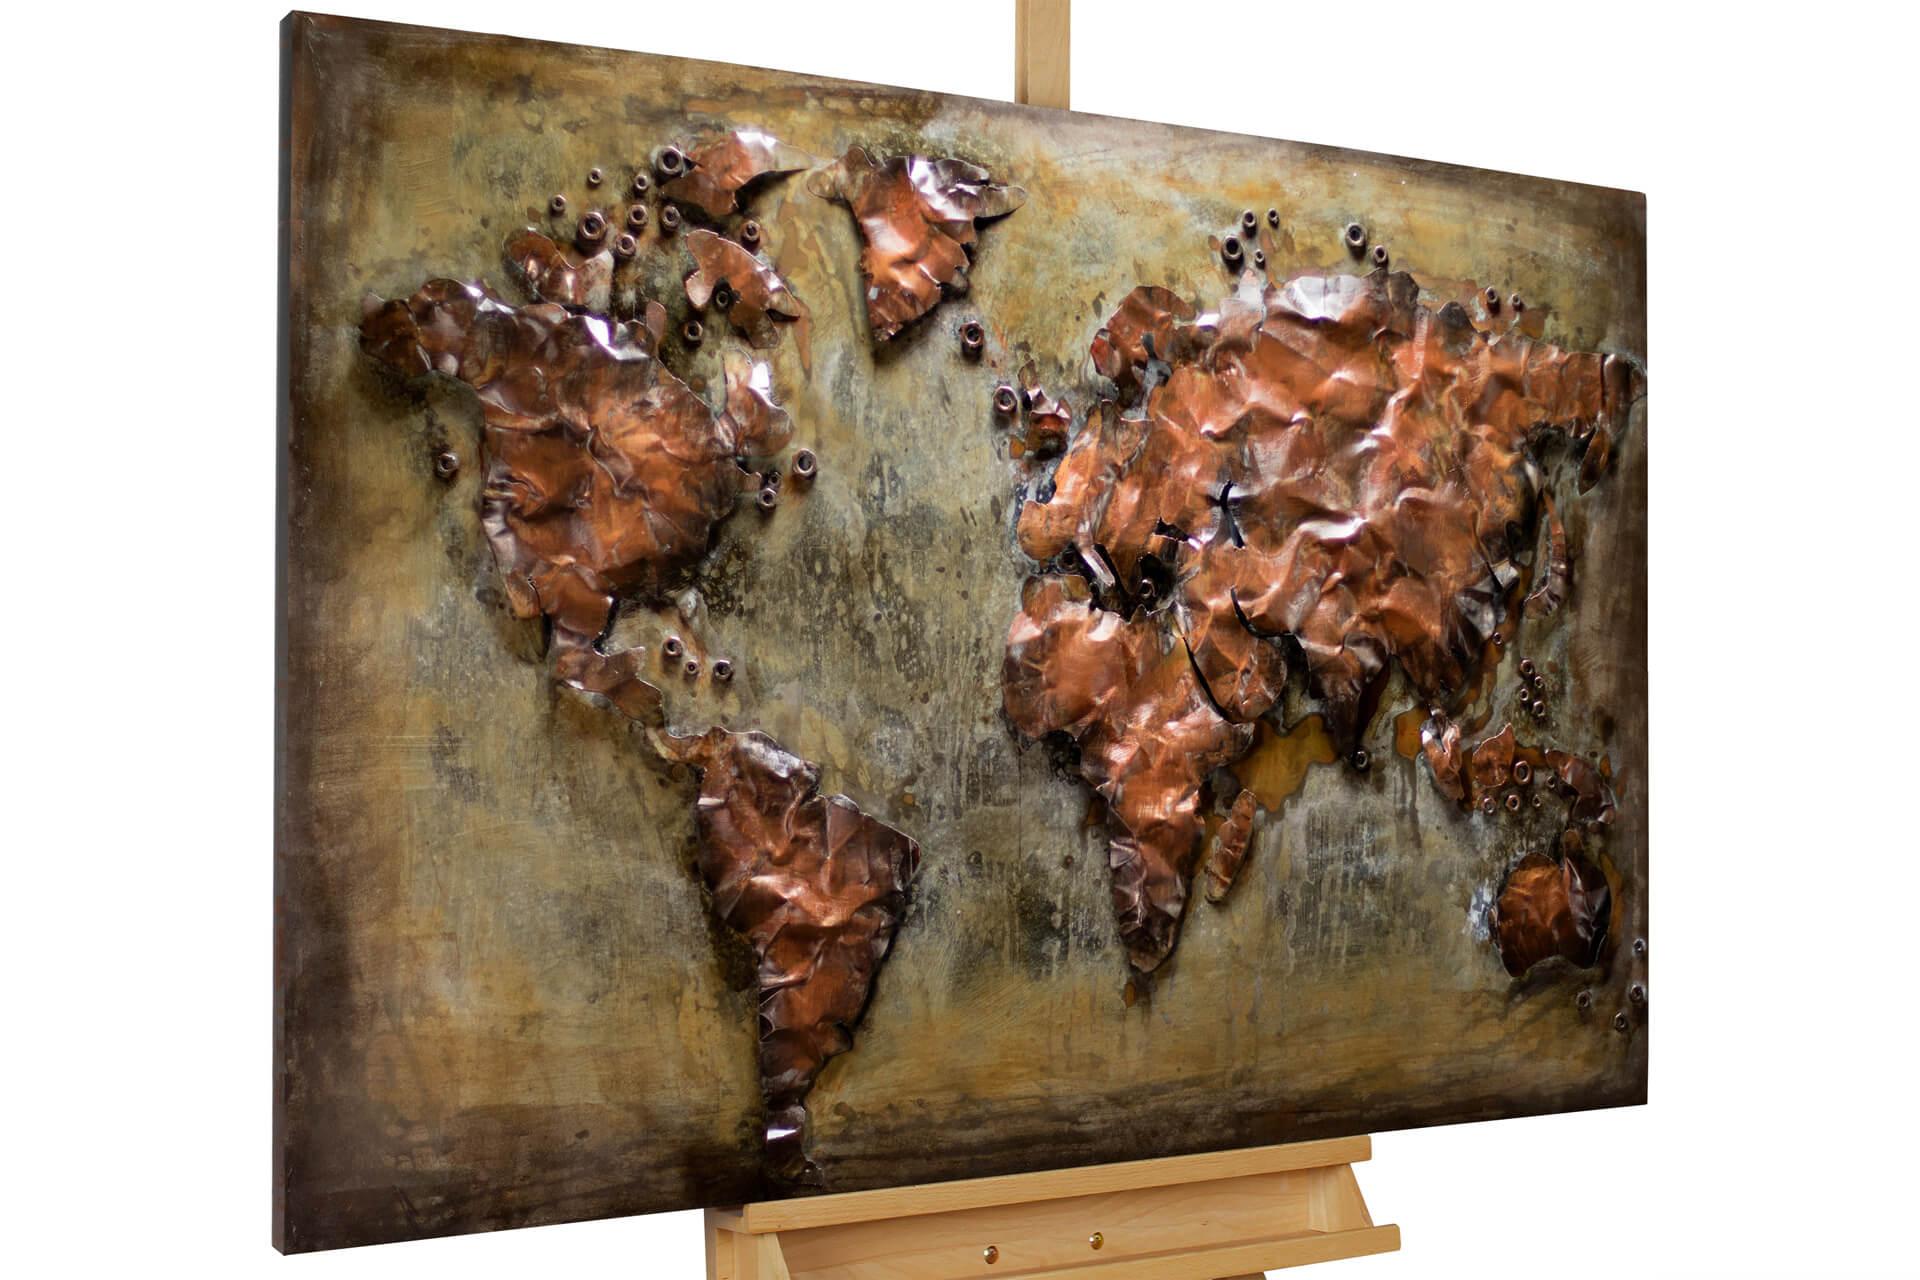 kl weltkarte landkarte erde kontinent karte metallbild 3d wandbild metall metallwandbild modern acryl gemaelde oel bild oelgemaelde 01